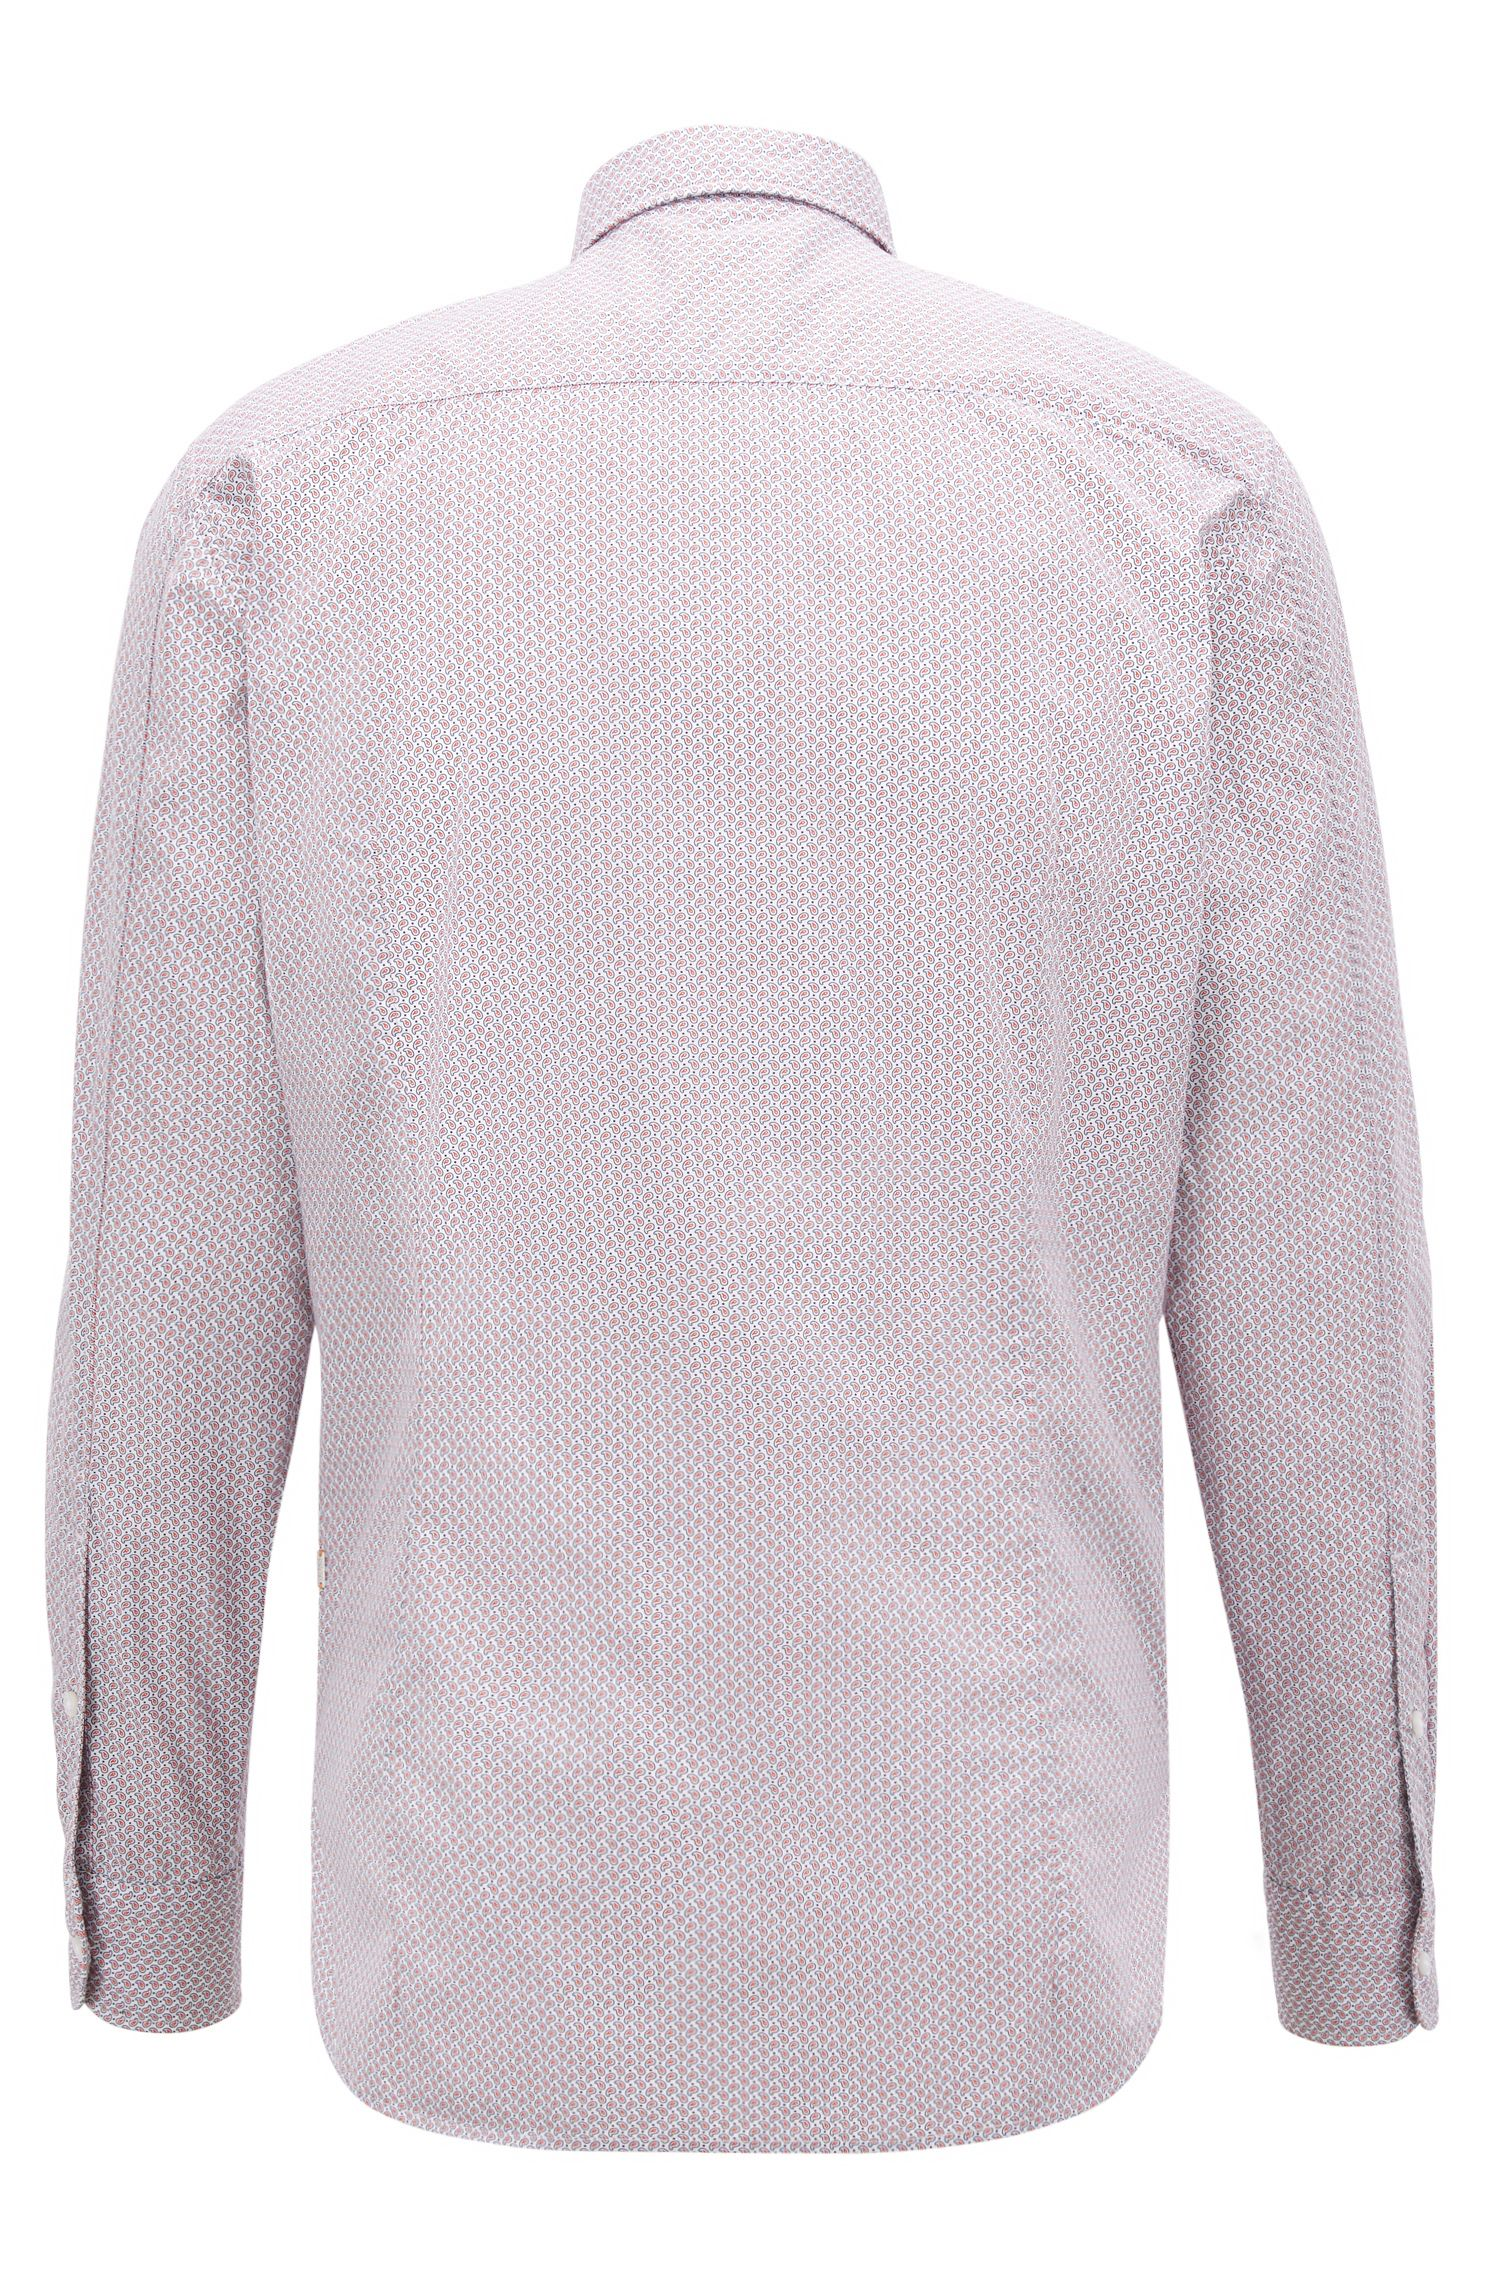 Slim-fit shirt in cotton with mini-geometric print, light pink